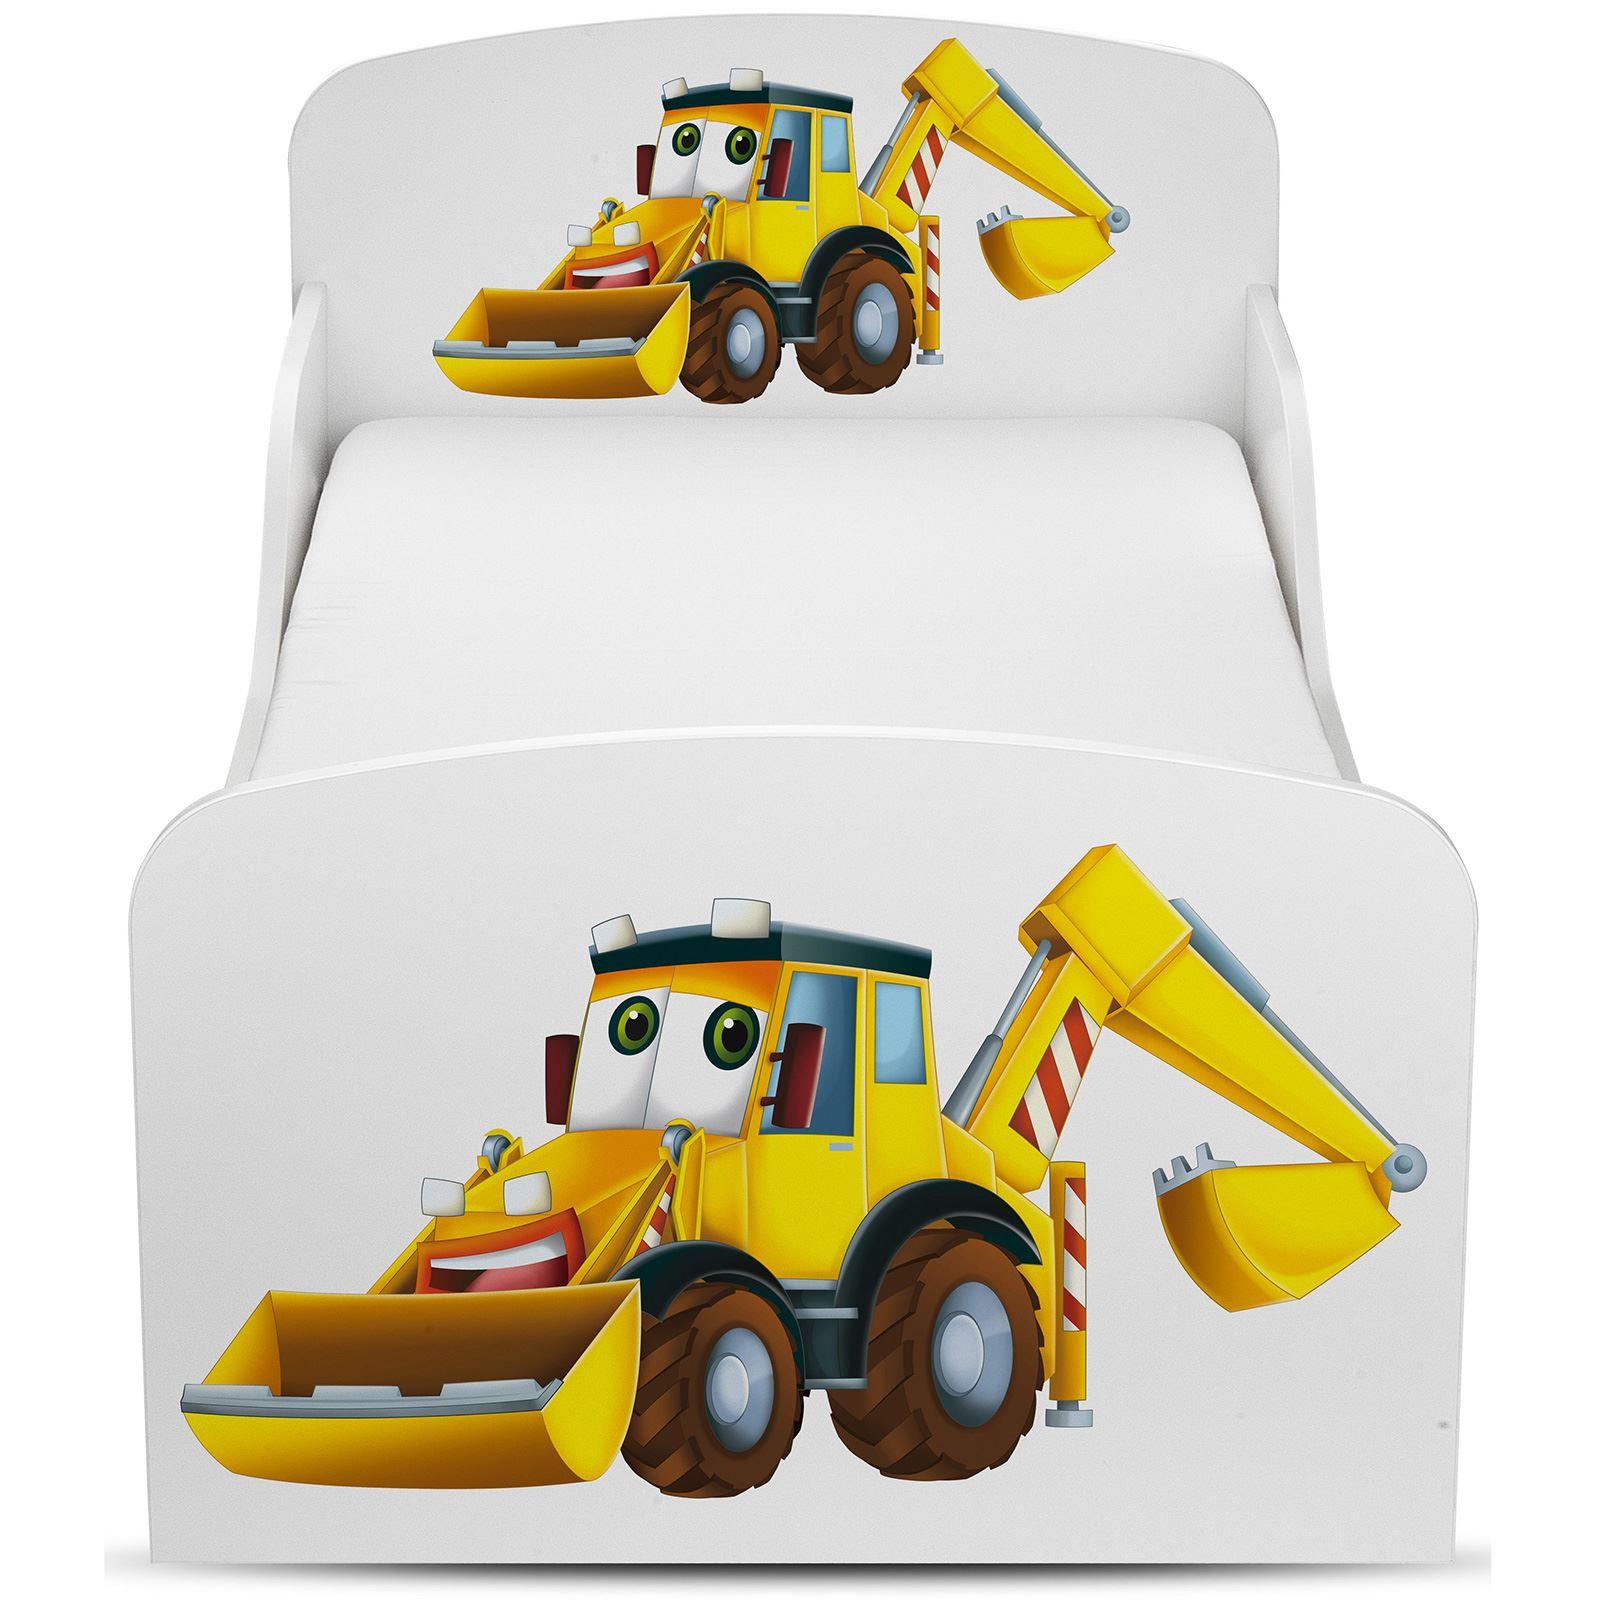 Price-Right-Home-Excavadoras-Cama-Infantil-con-o-Sin-Almacenaje-Colchon miniatura 14